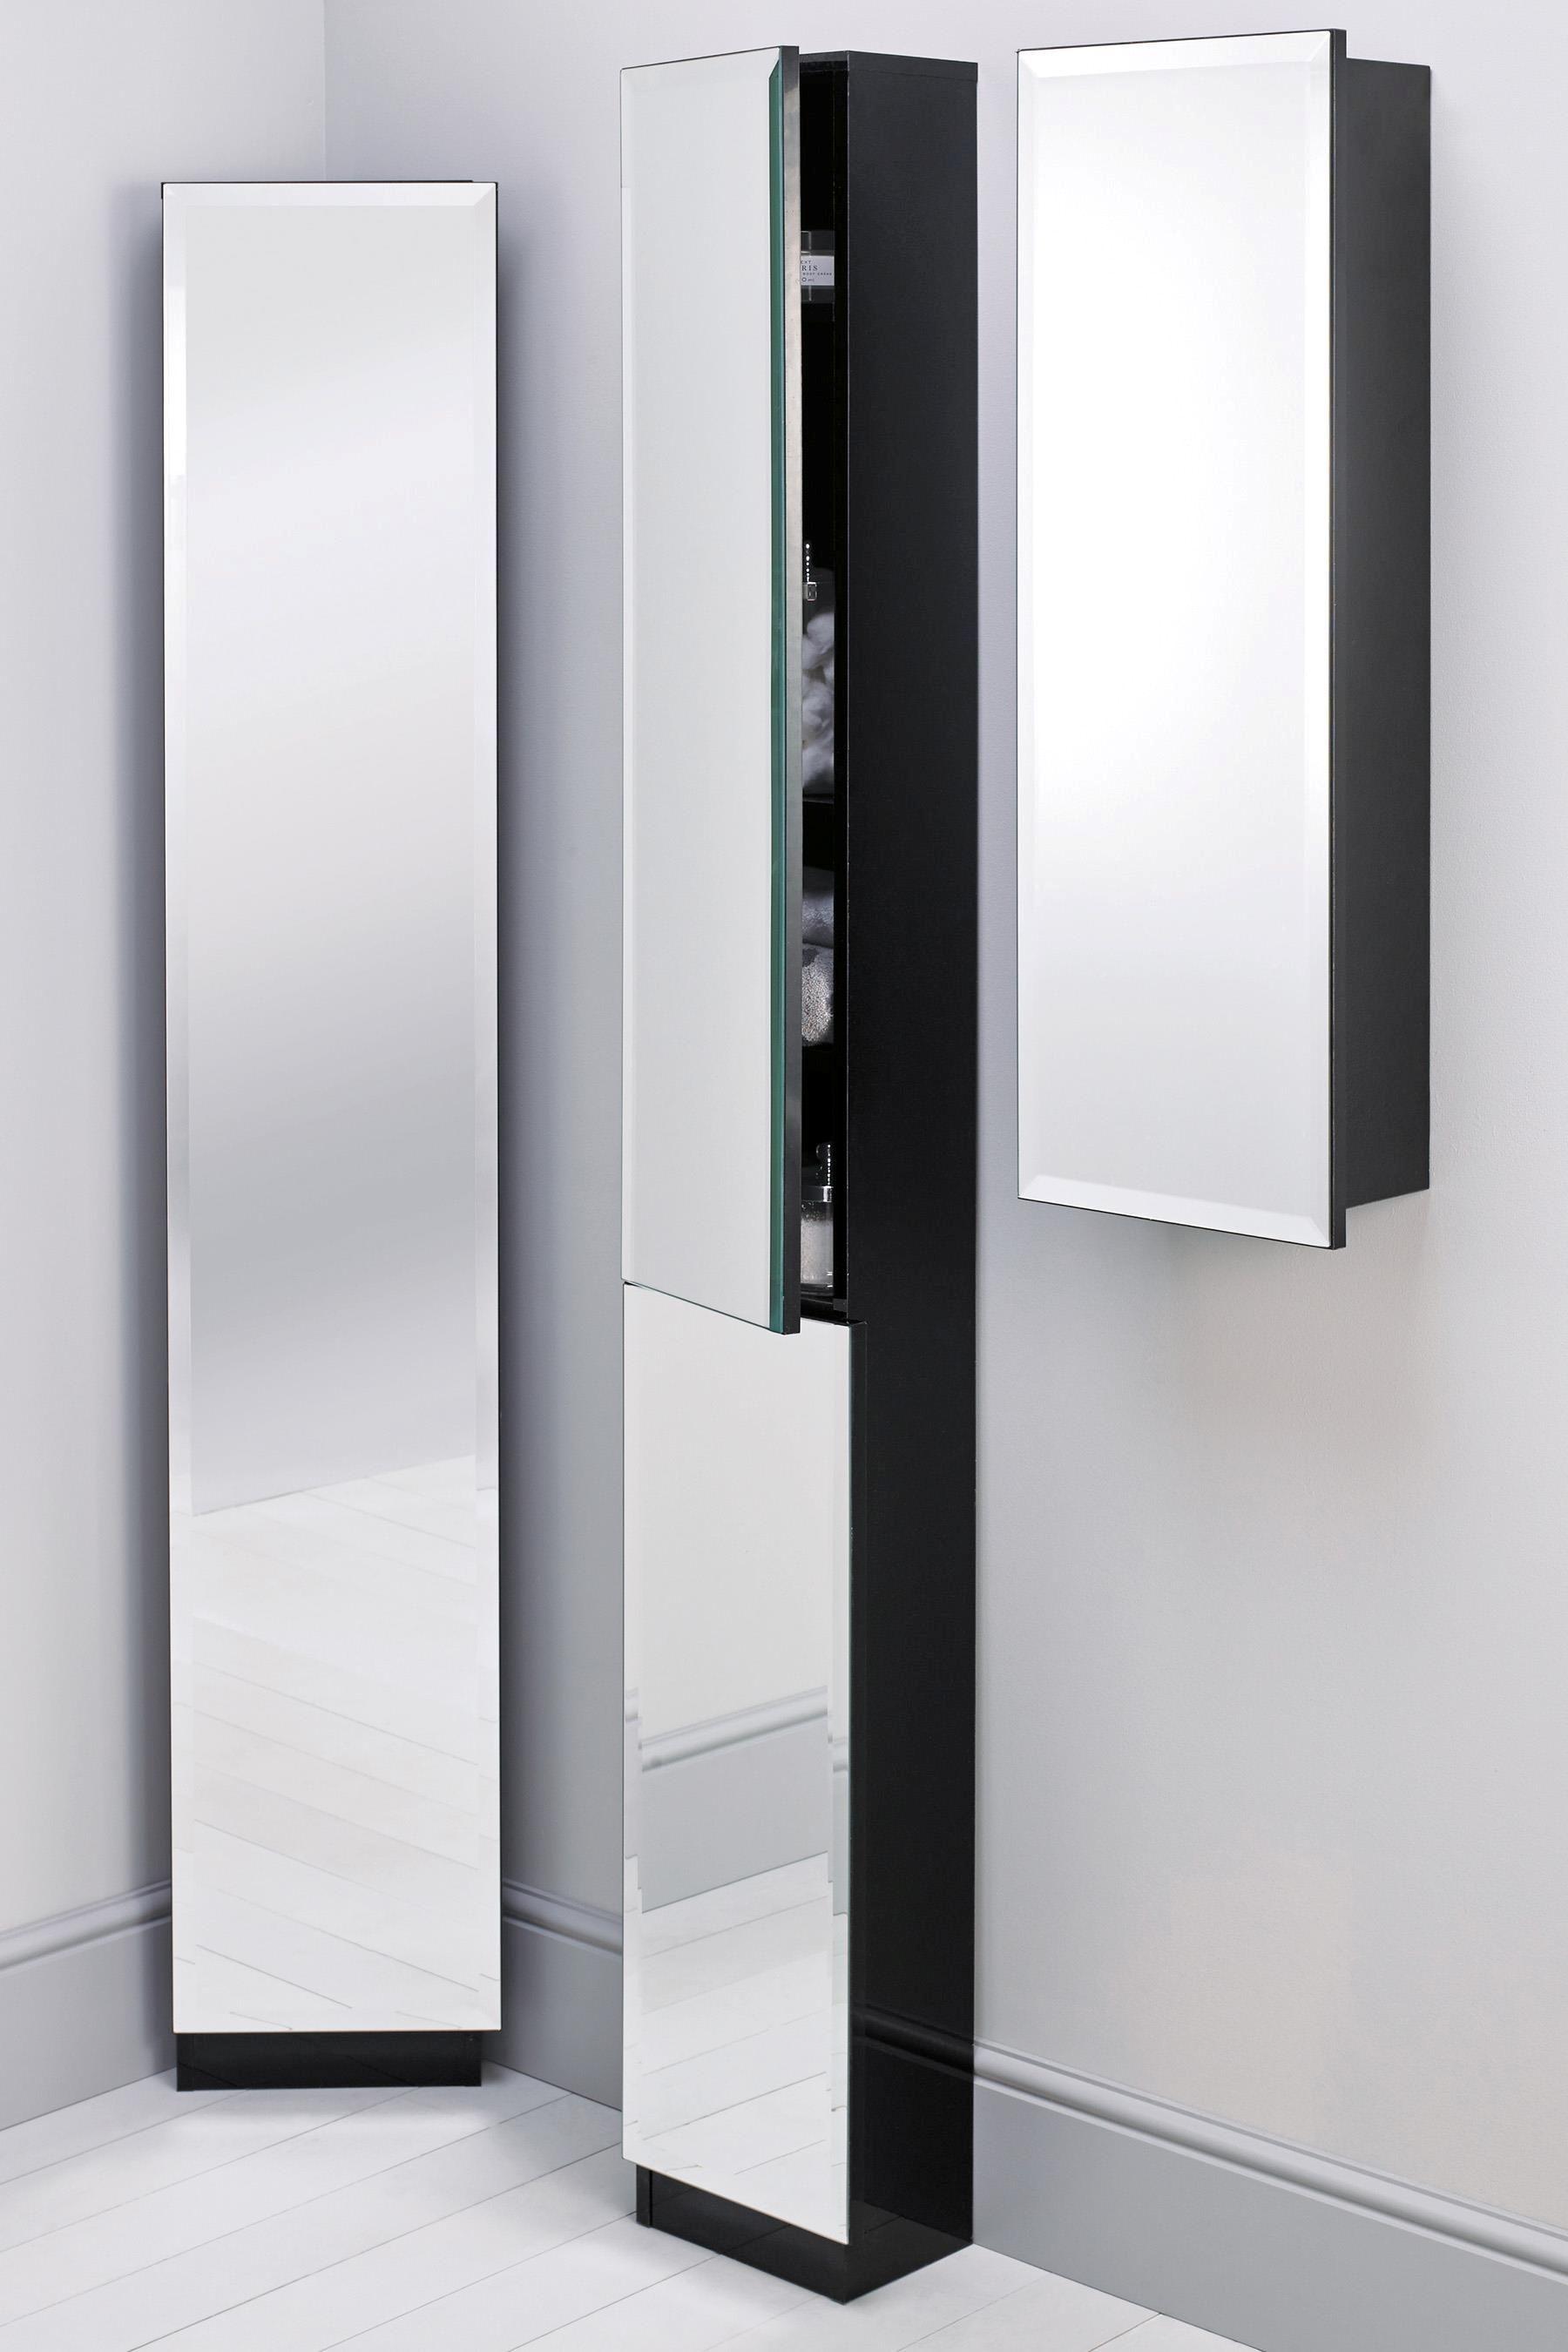 Image Result For Glass Bathroom Cabinets Modern Tall Bathroom Storage Bathroom Storage Cabinet Slim Bathroom Storage